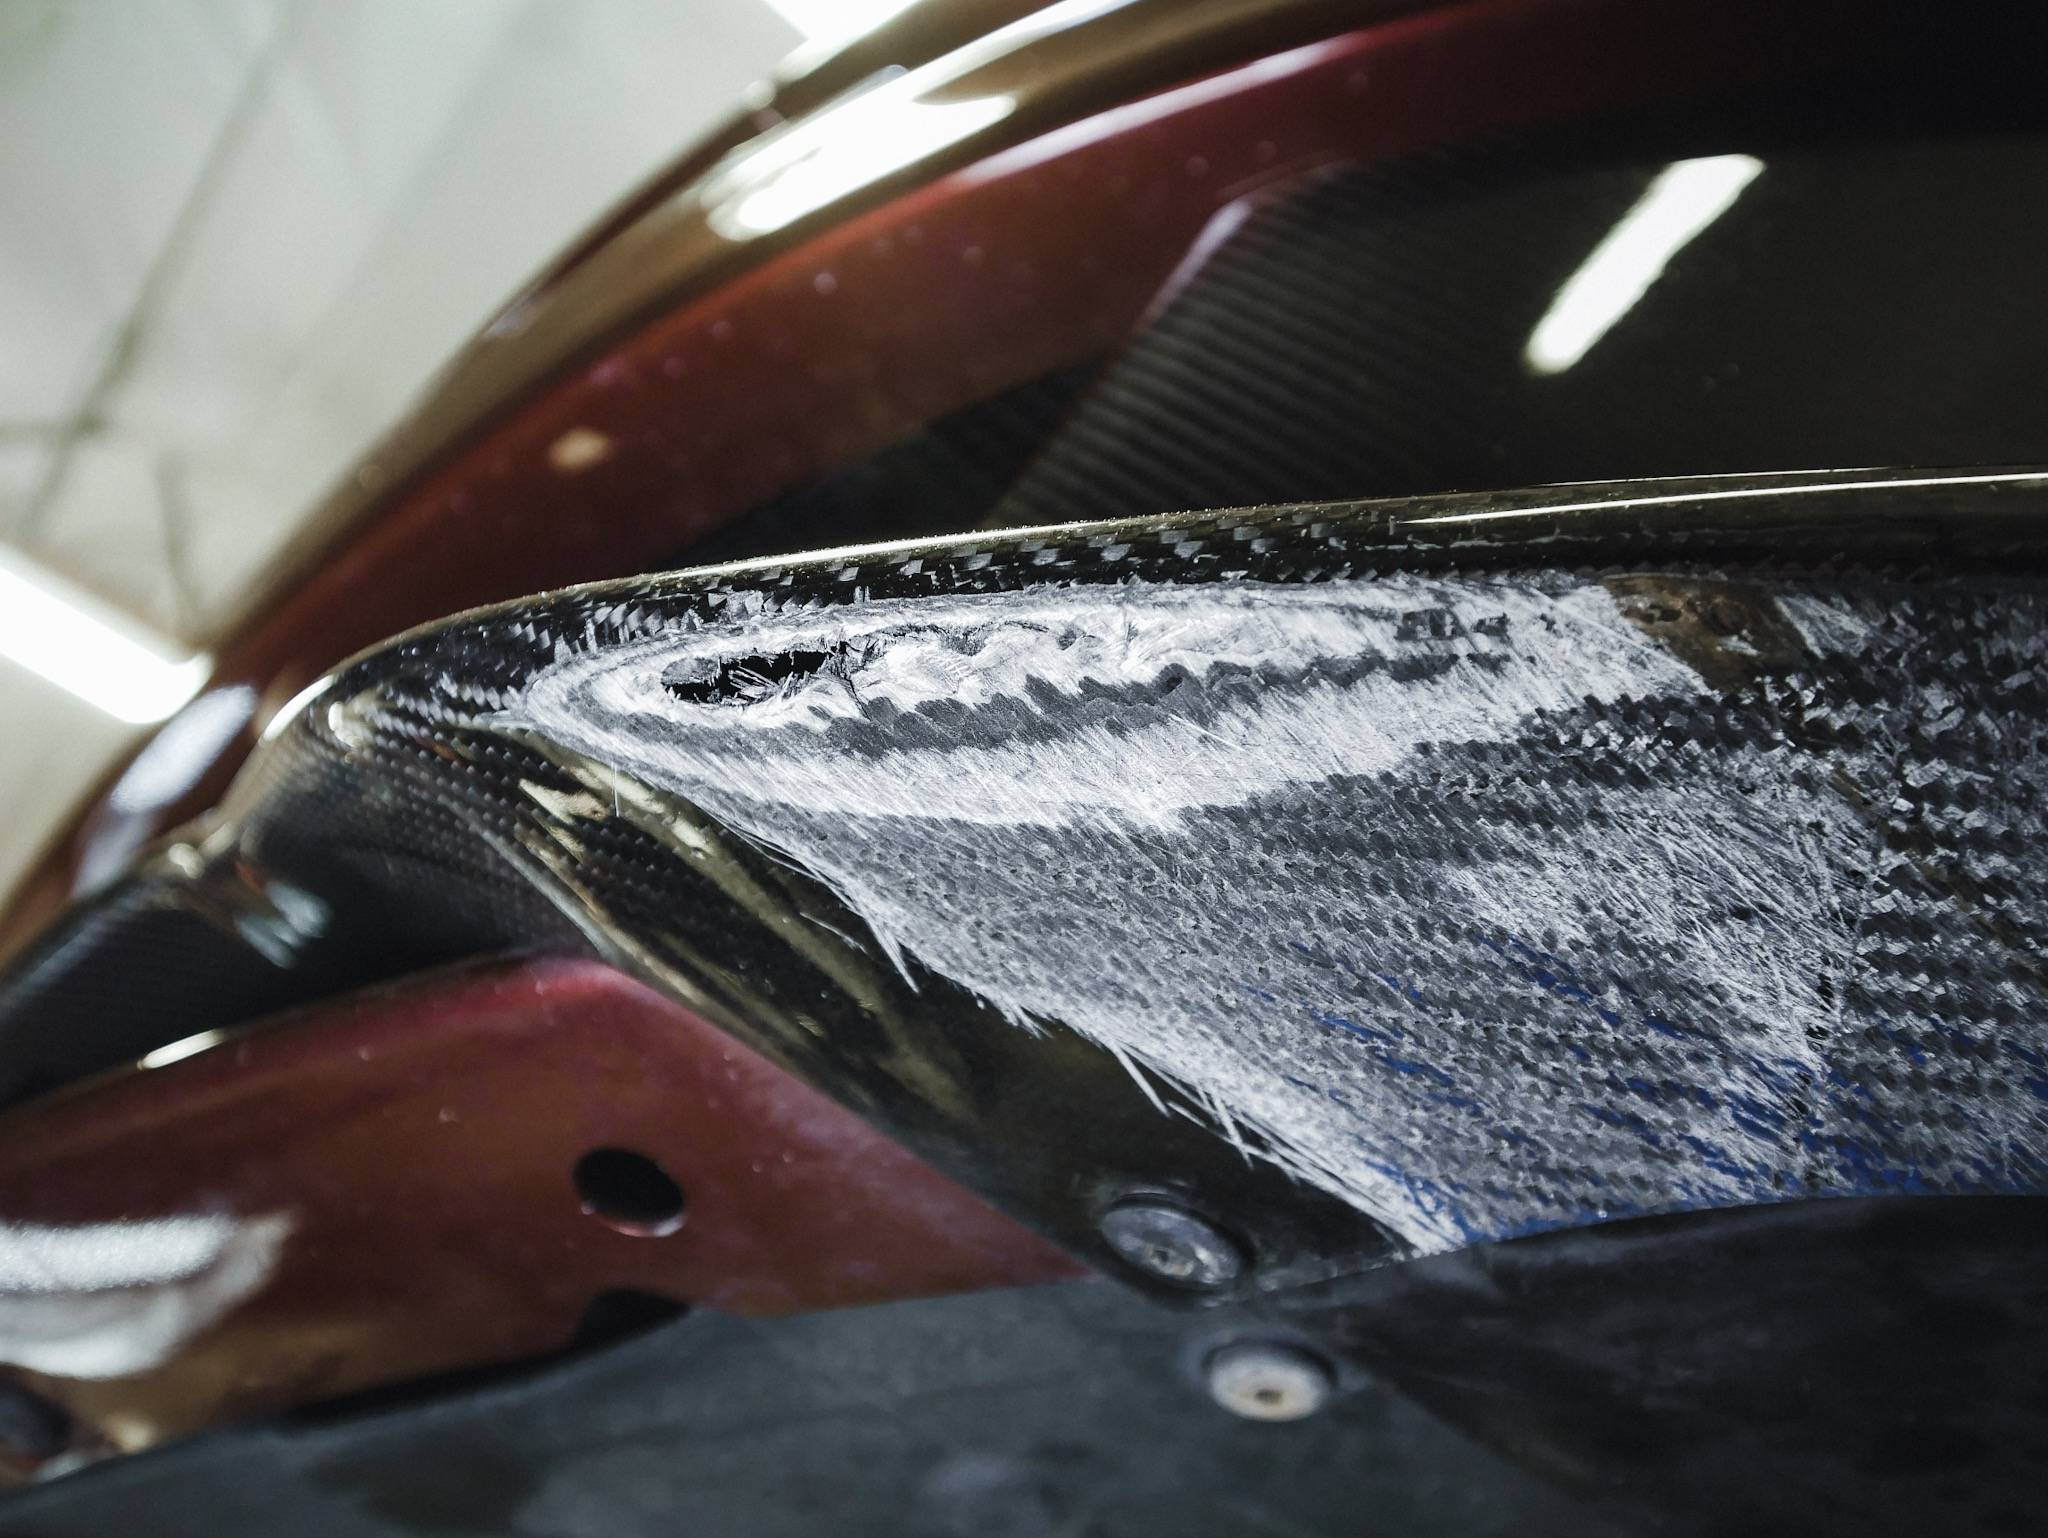 Aston Martin Vanquish After 30,000 Miles - Scrape Armor